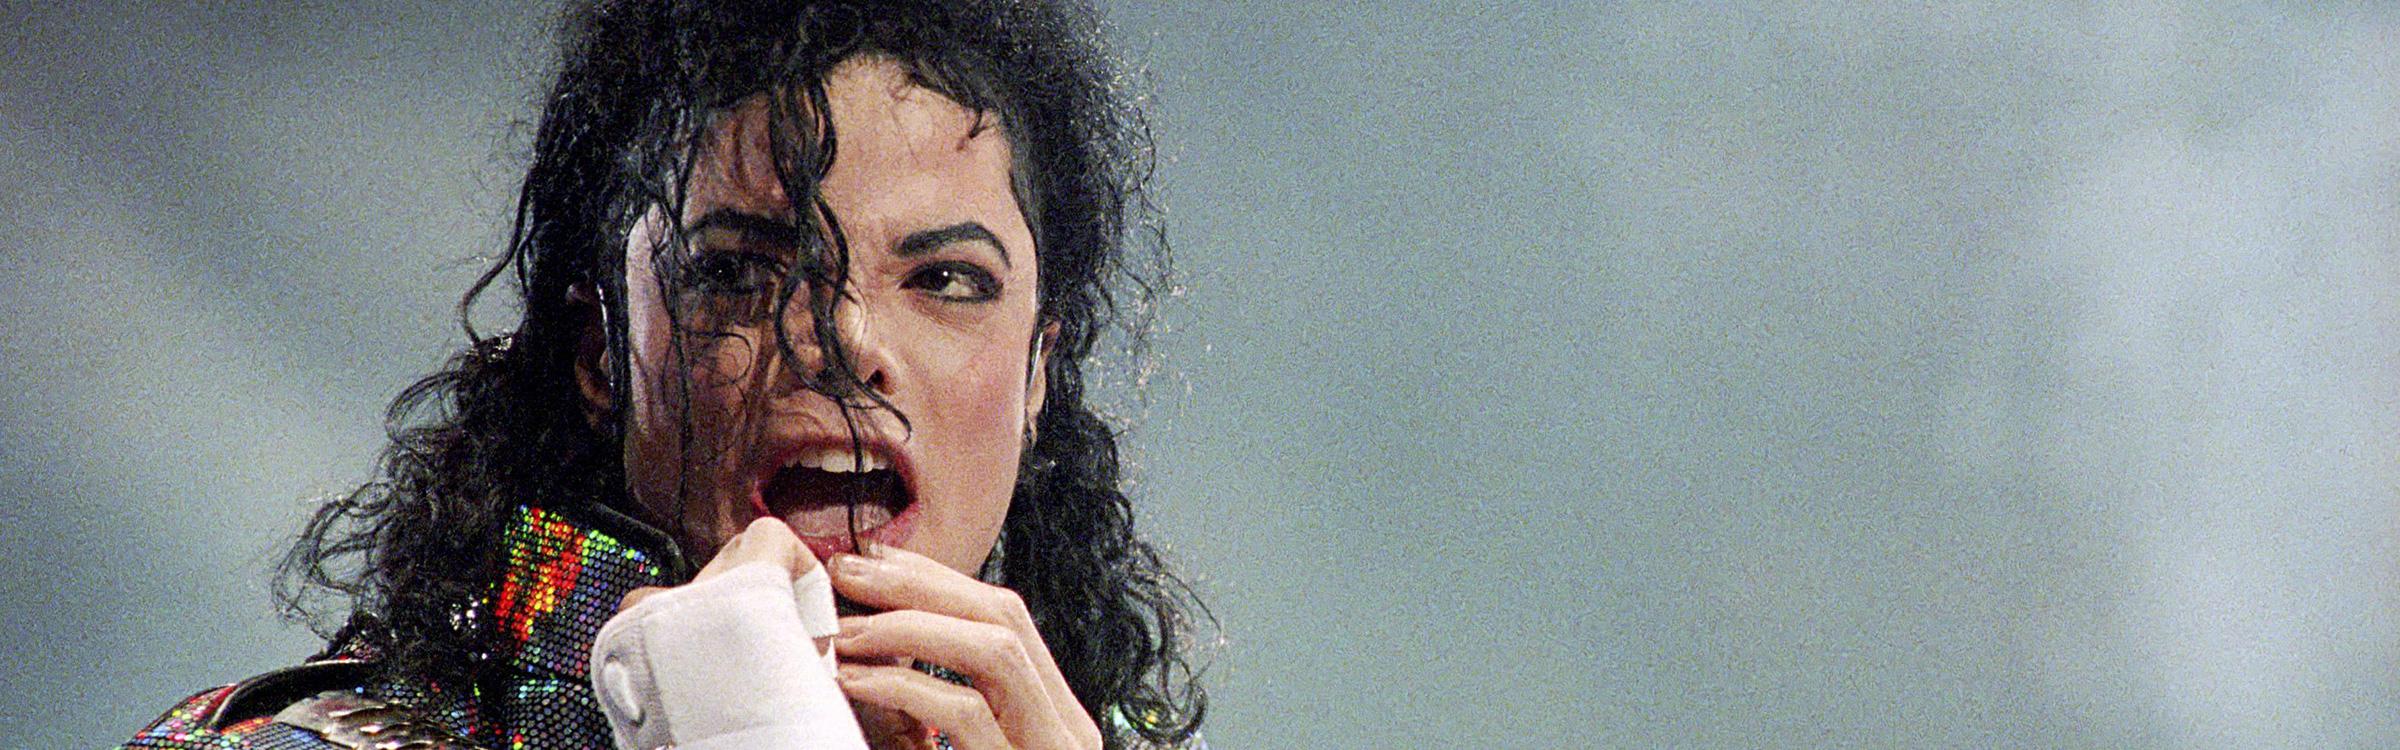 Michael header